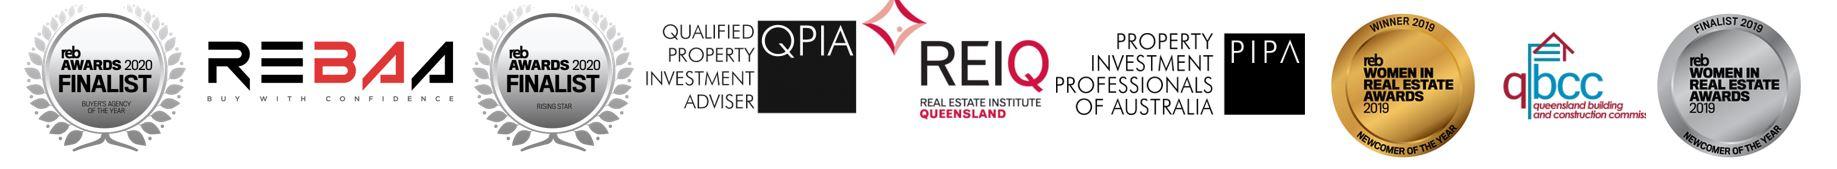 Buyers Agent Brisbane Awards and Memberships